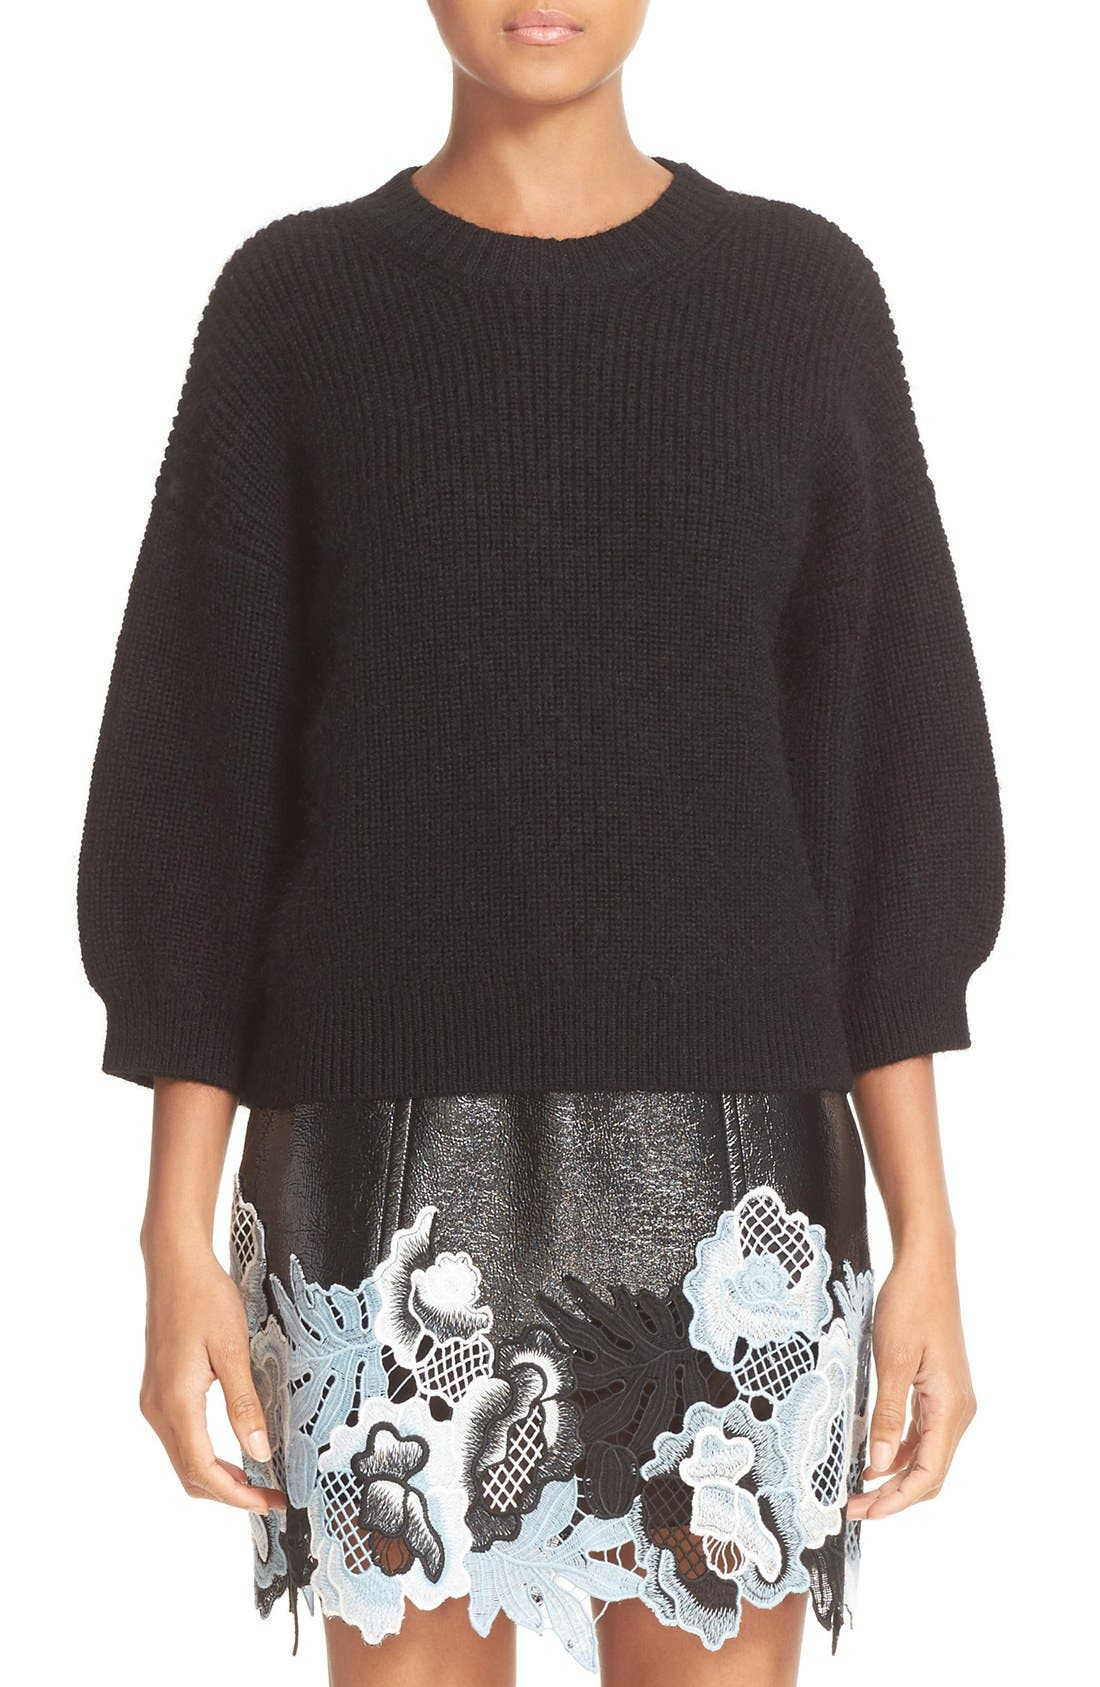 Alternate Image 1 Selected - 3.1 Phillip Lim Rib Knit Wool Blend Sweater